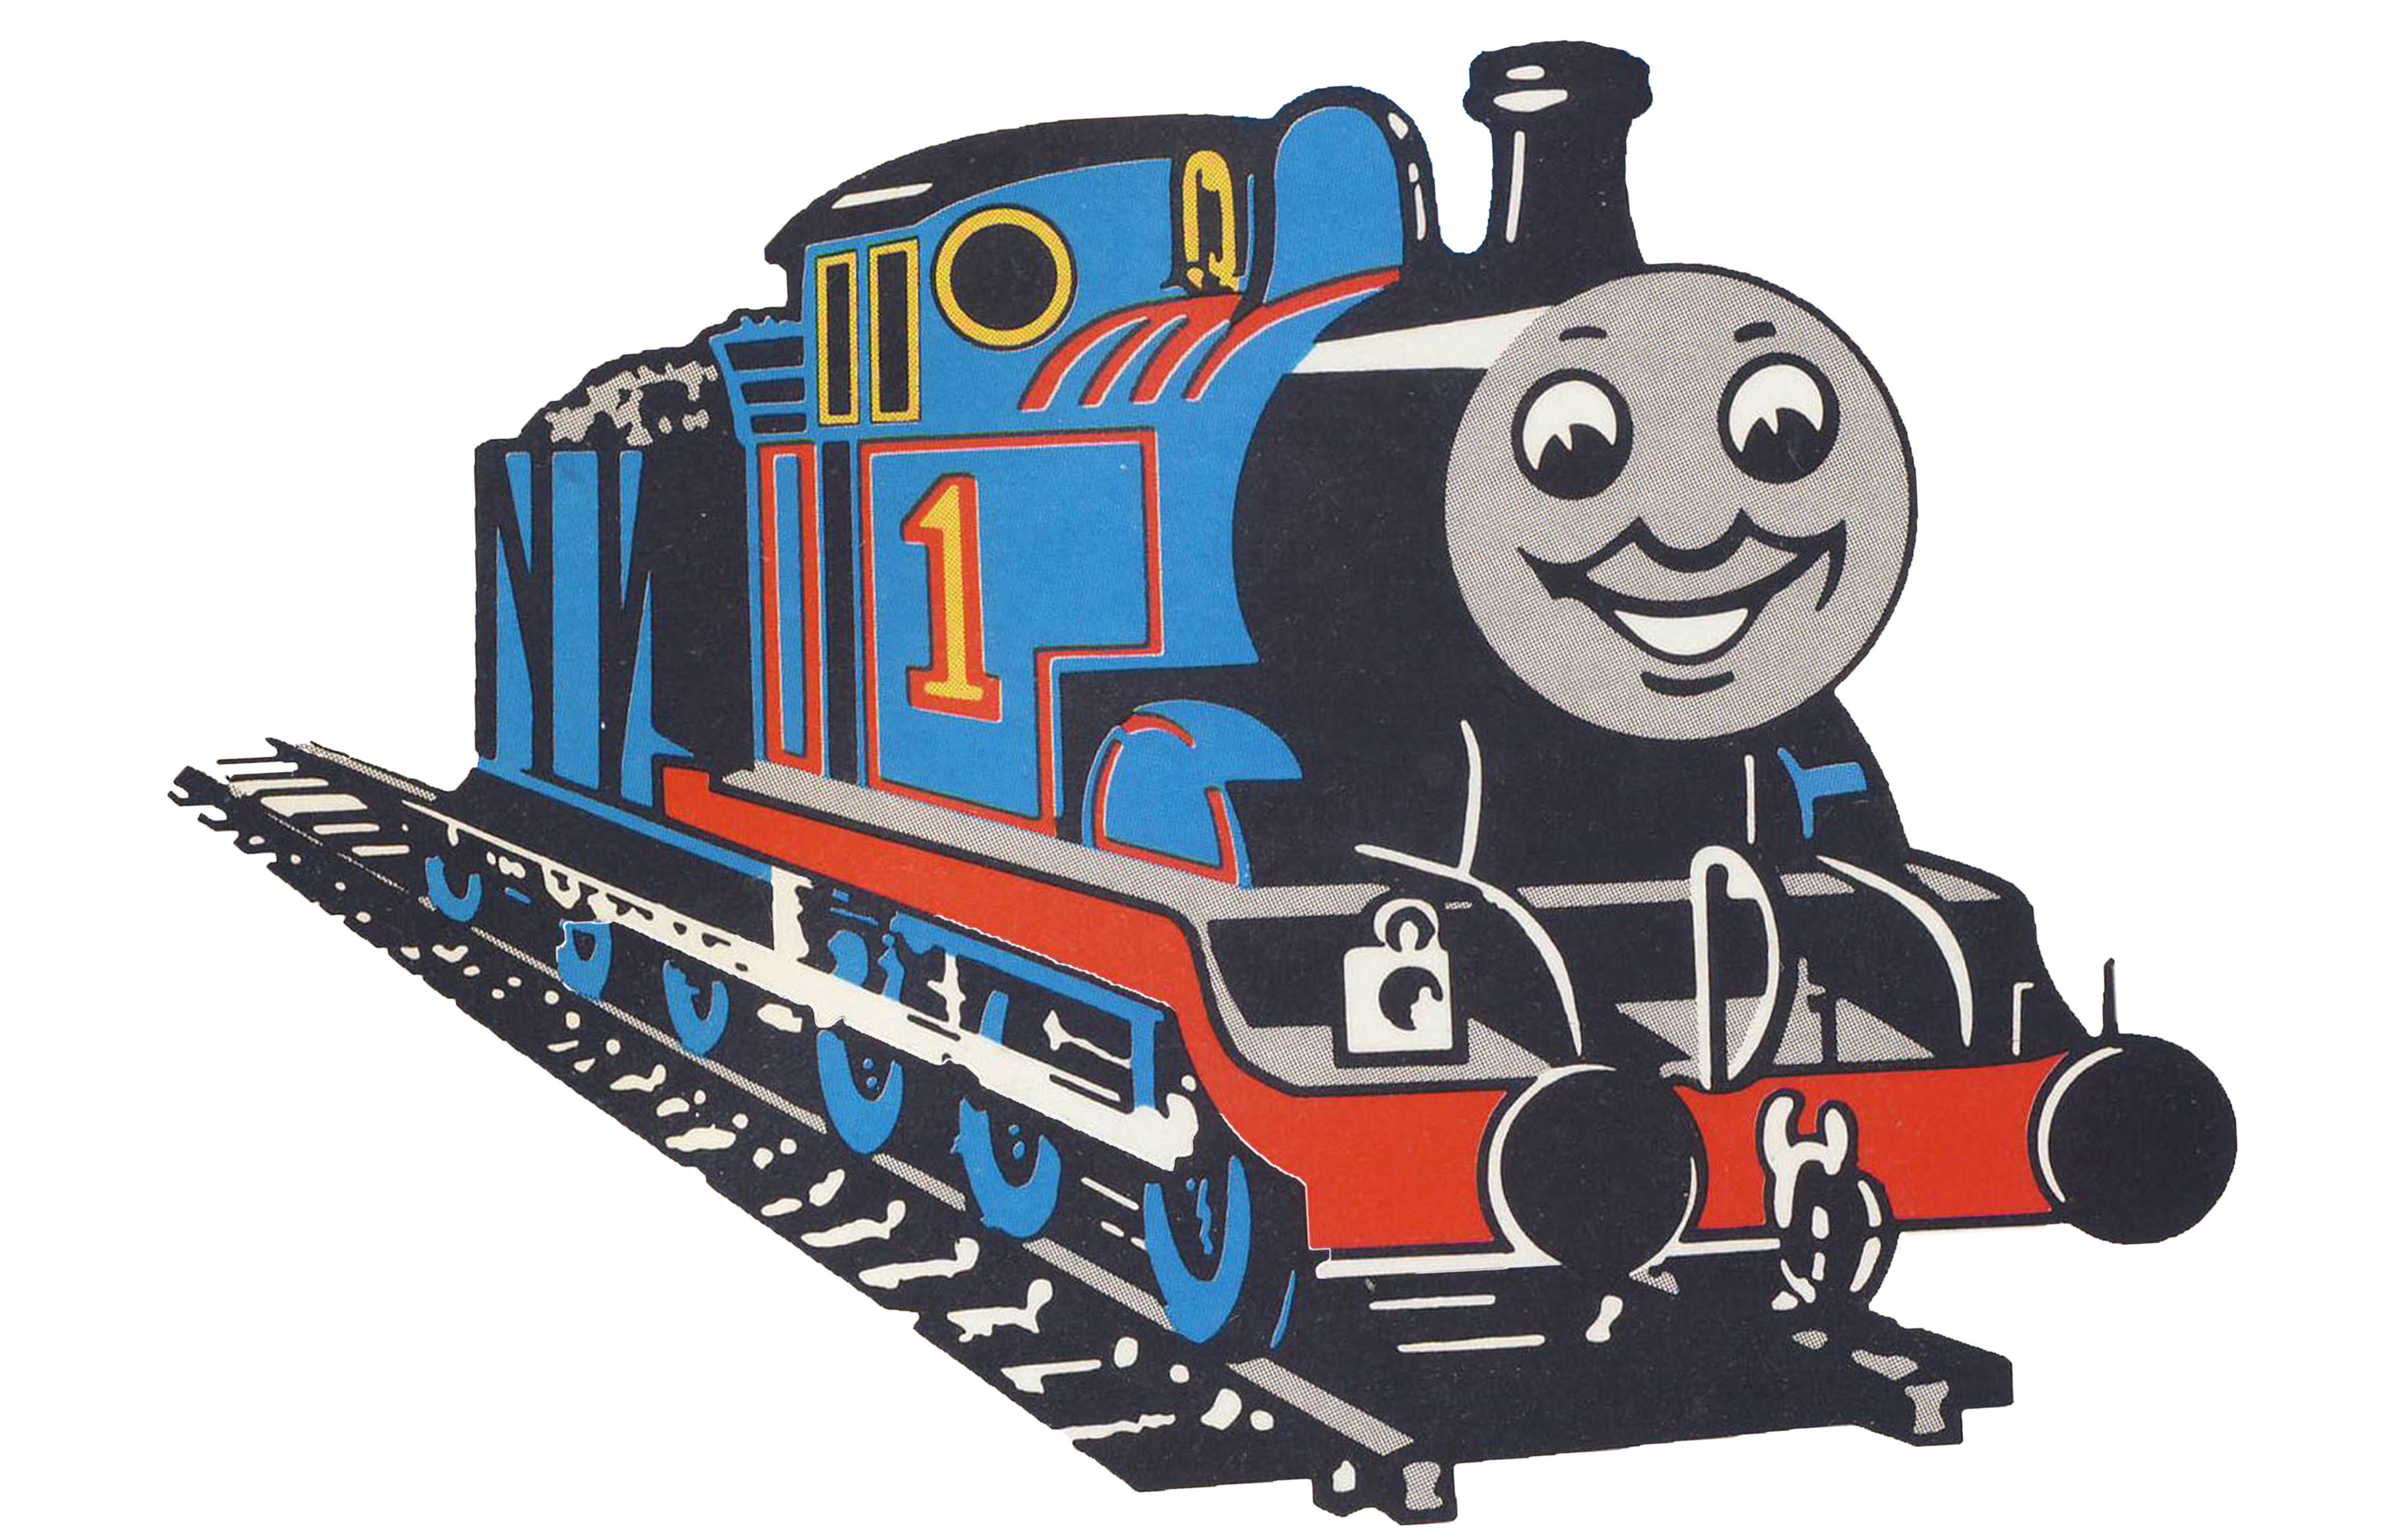 The Railway Series